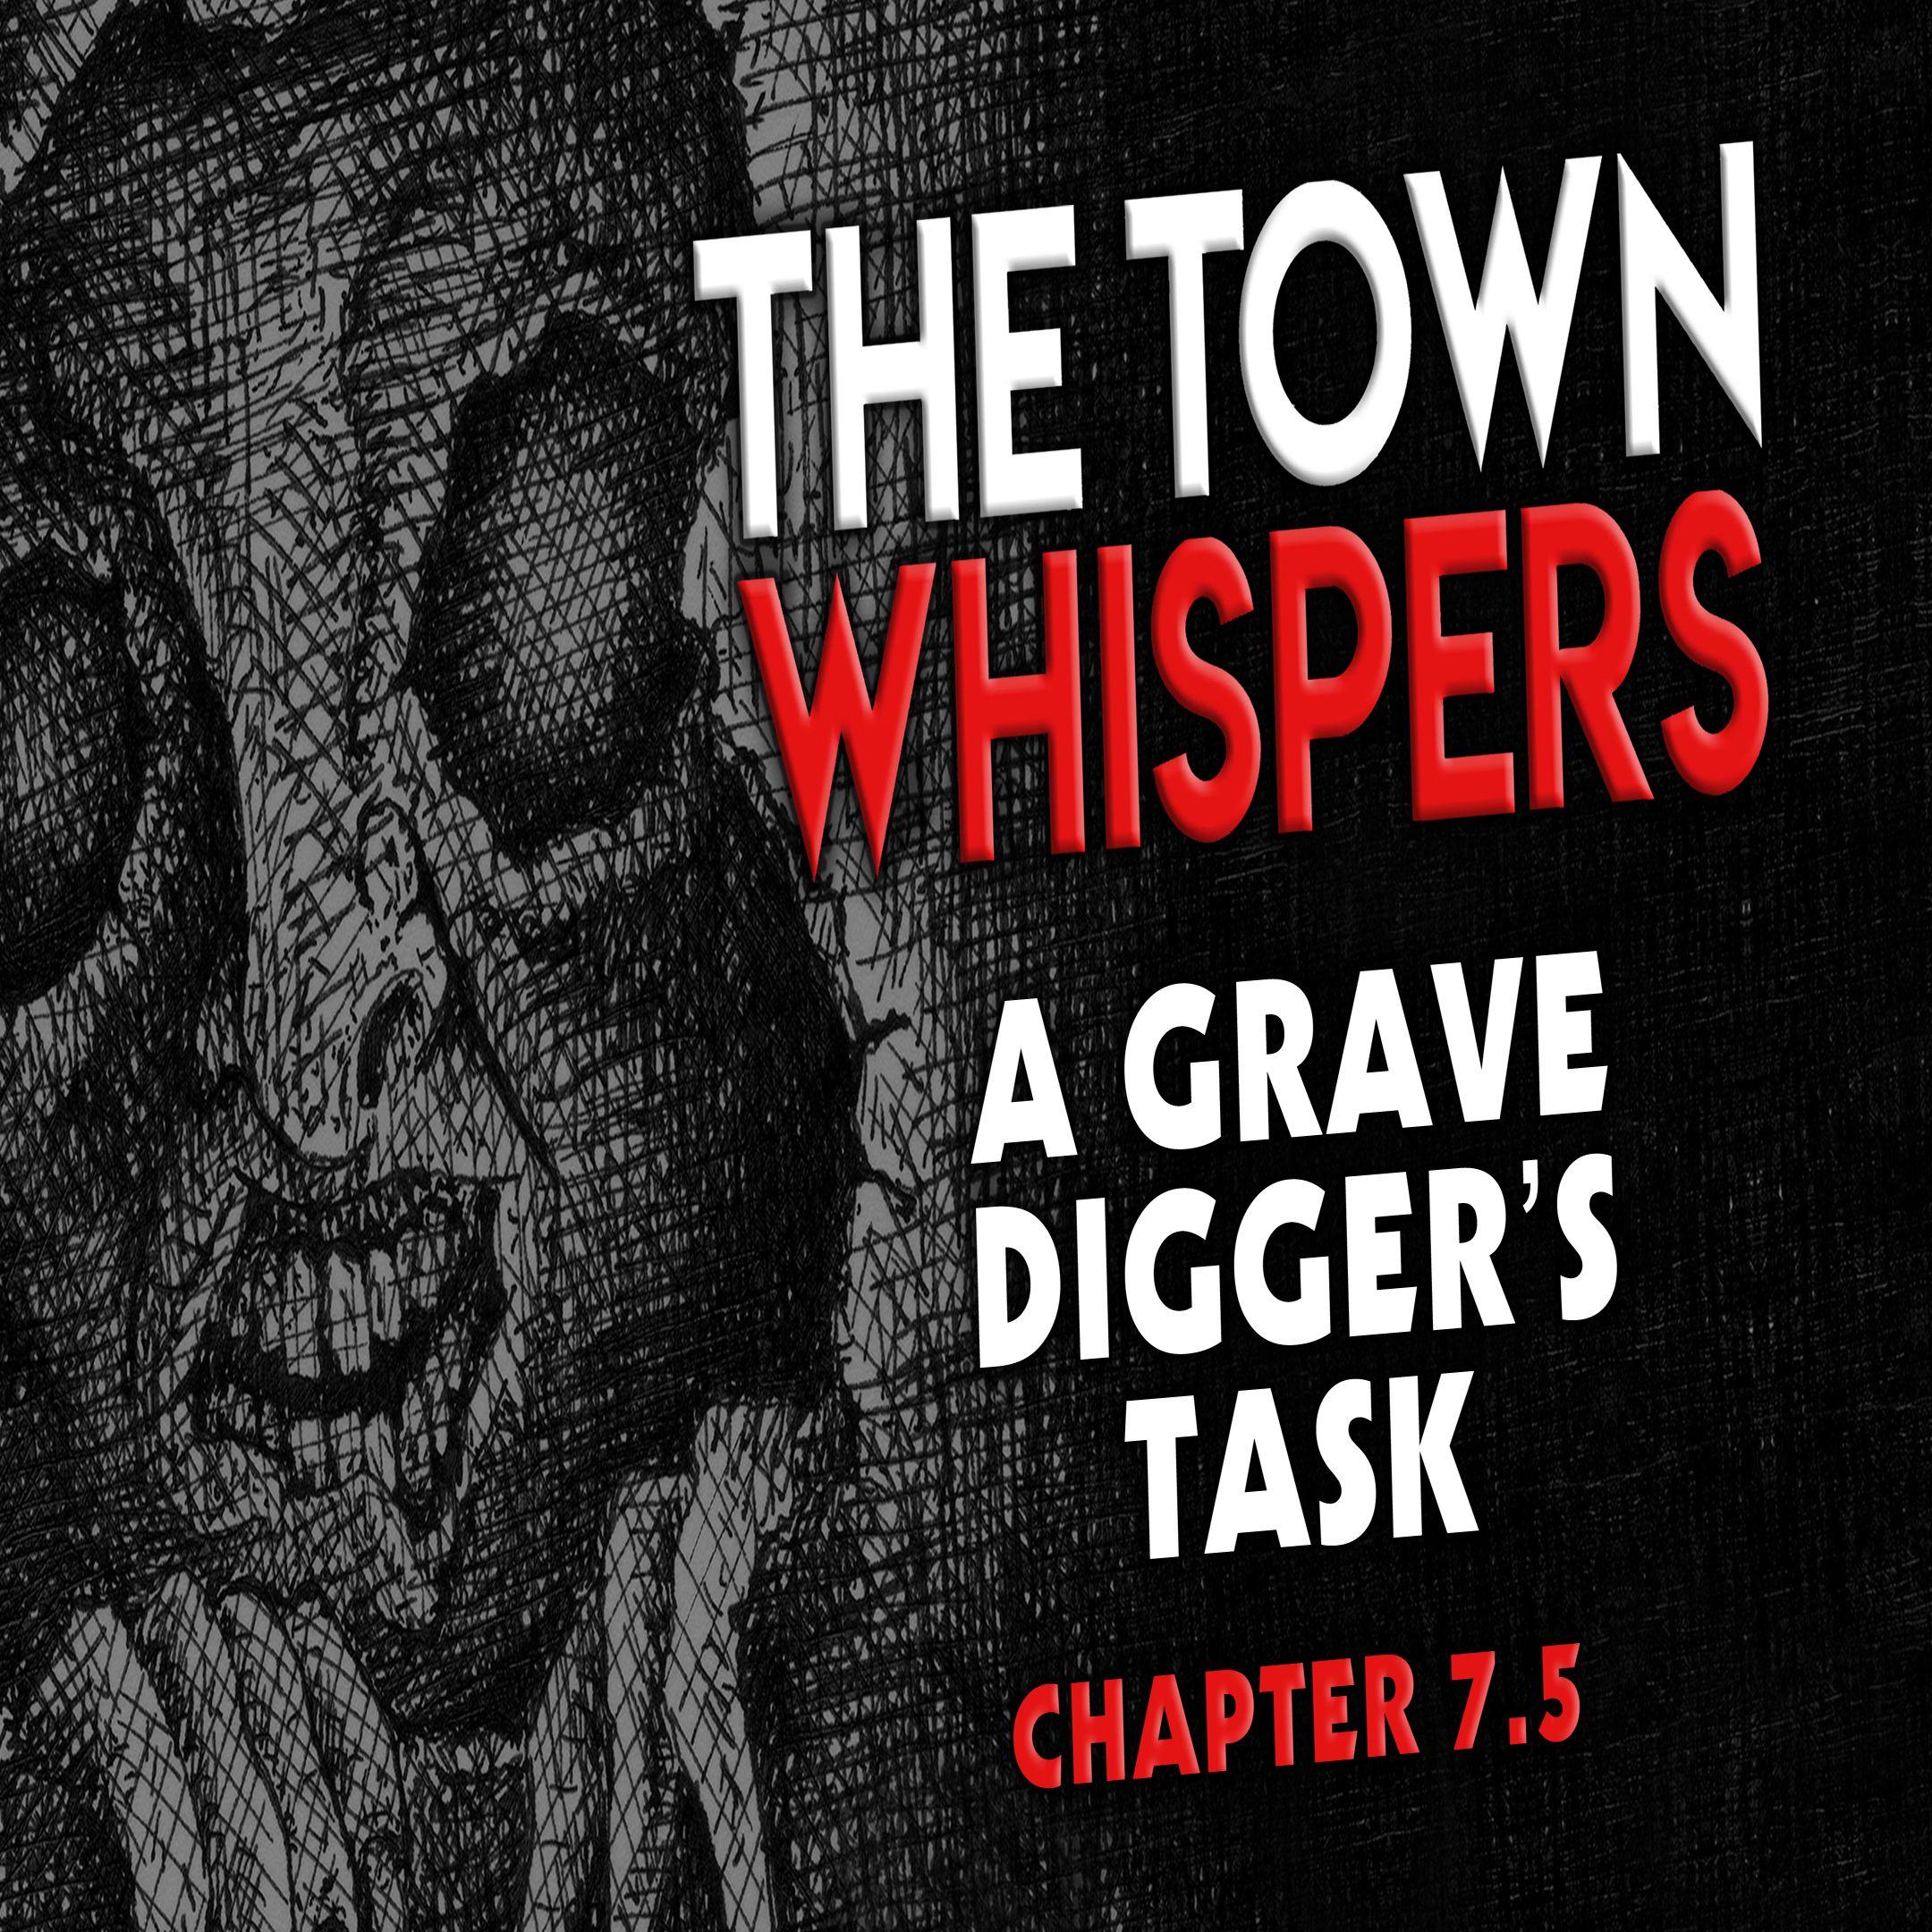 Chapter 7.5: A Gravedigger's Task